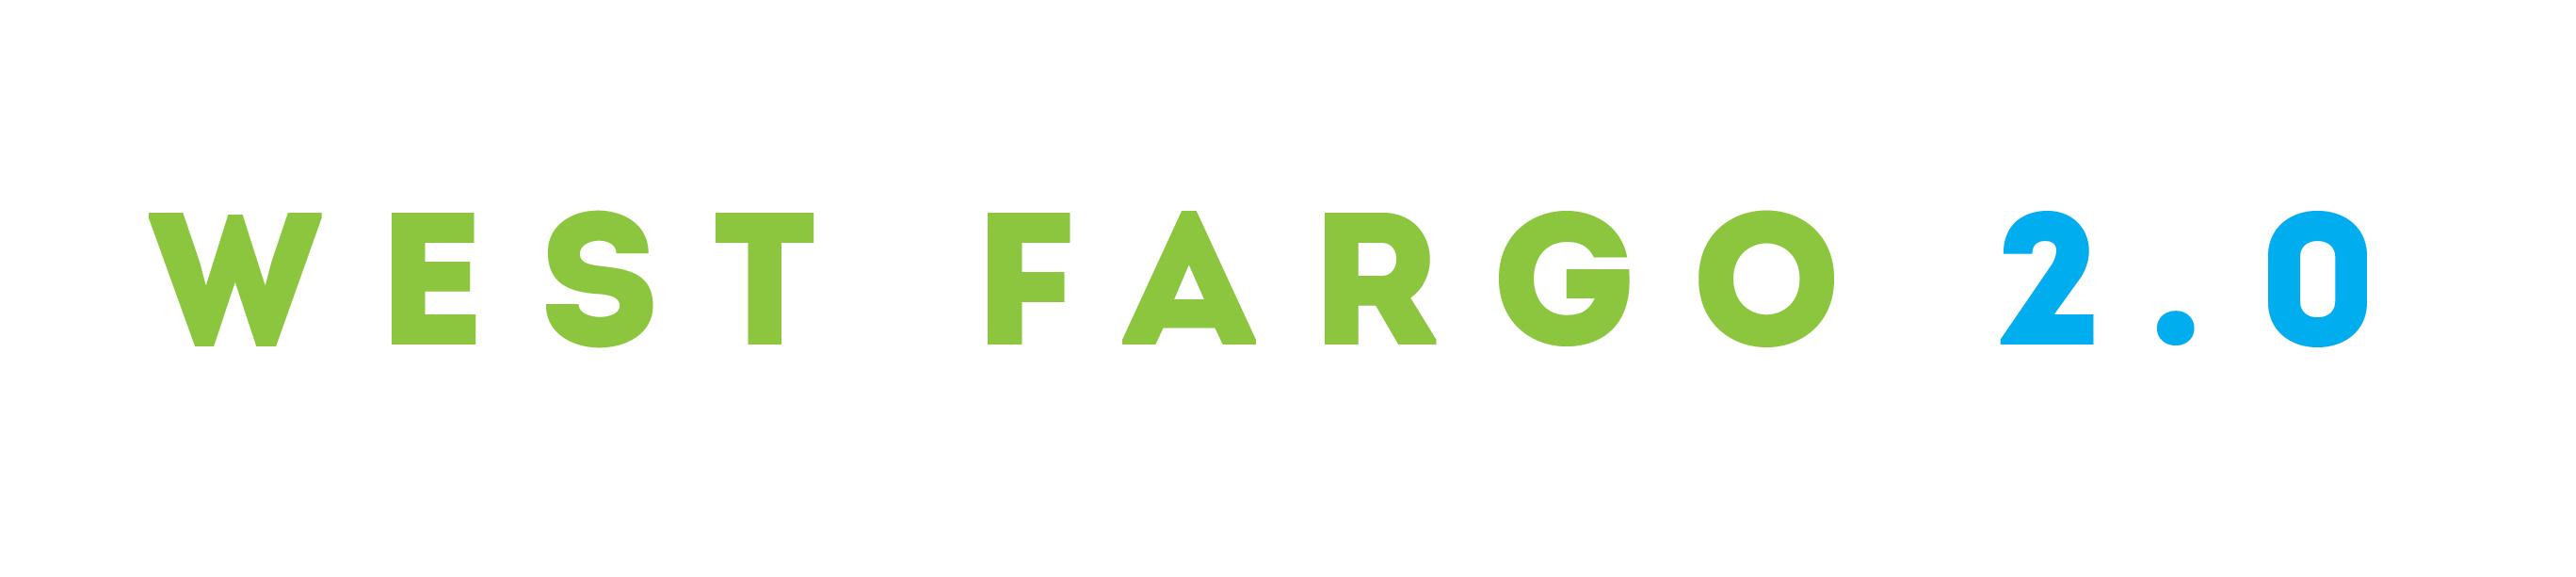 West Fargo 2.0